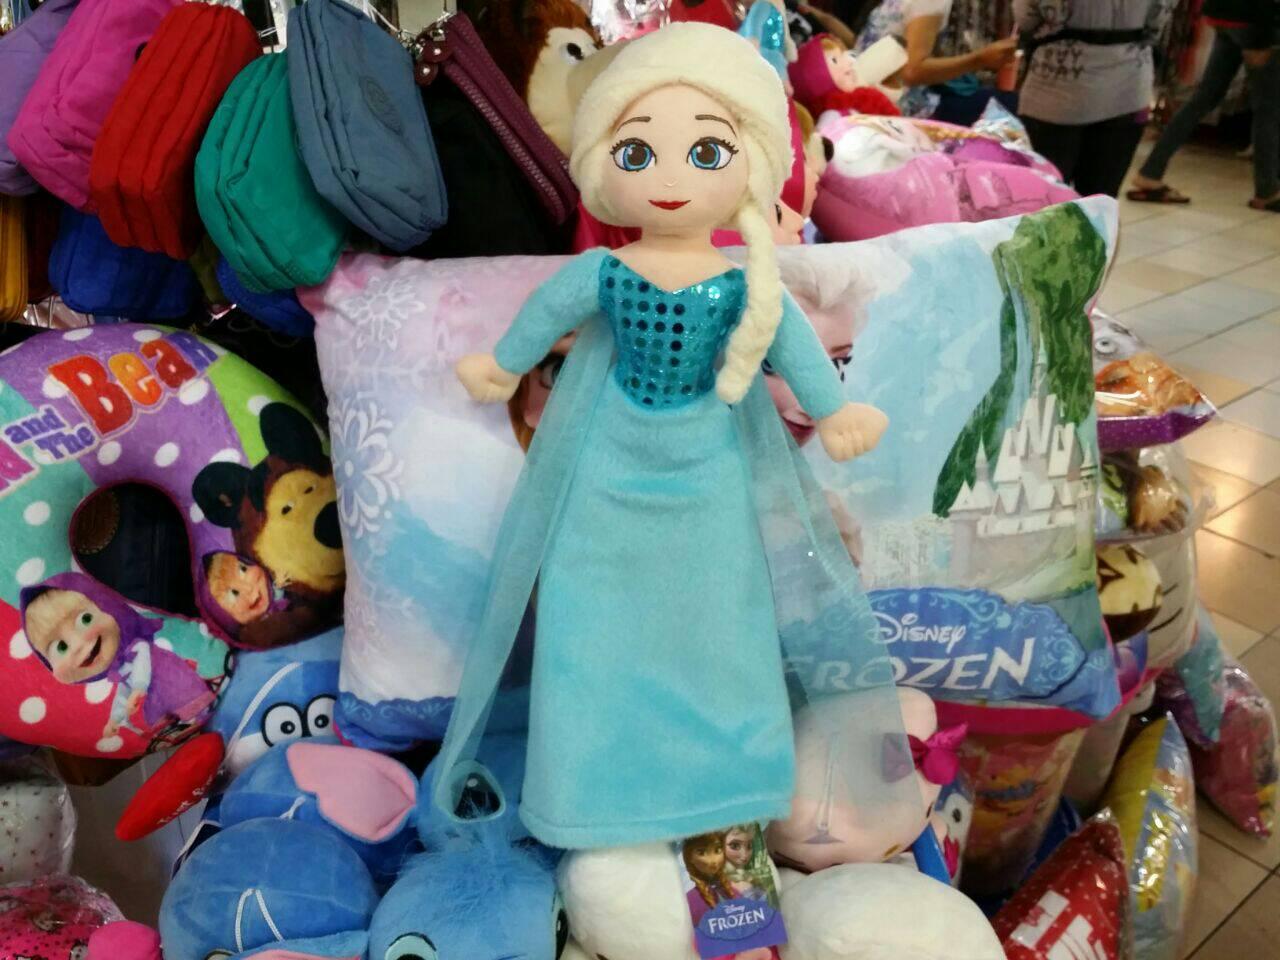 Jual My Boneka Elsa Frozen Original from Disney - AGIN ONLINE ... e4b5a312d0